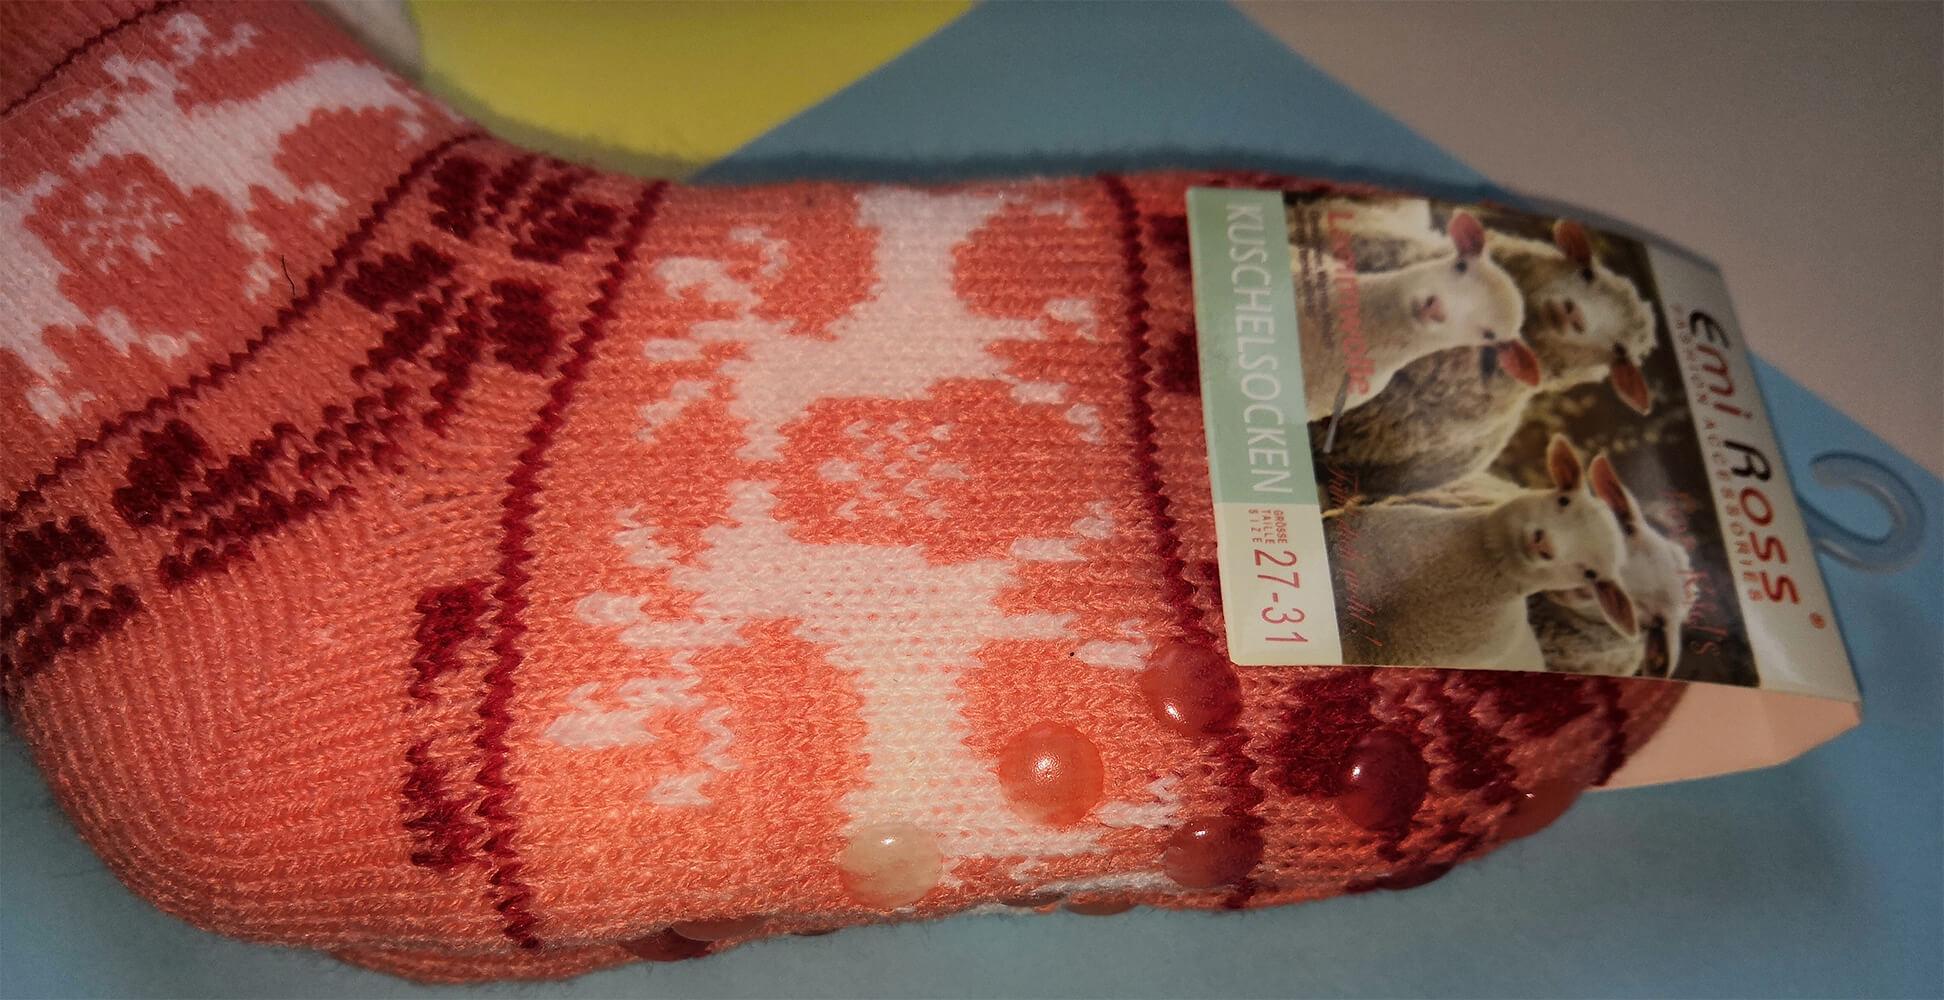 Детские носки-тапочки Emi Ross EJ-6209-c кораллового цвета. 27-31 размера. Фото 3